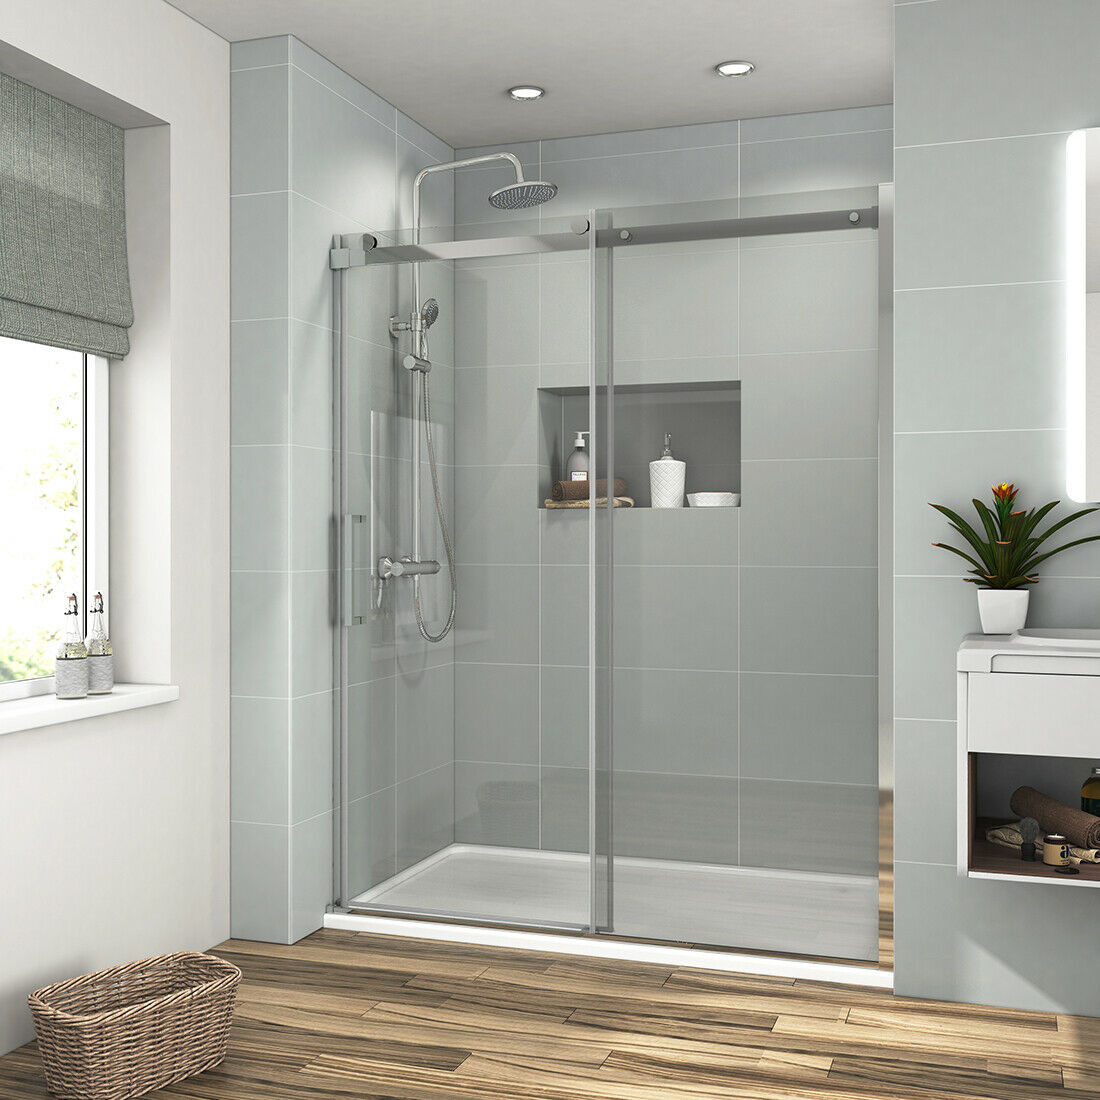 Bath 60 X 72 Frameless Sliding Shower Door Screen 5 16 Glass Bathroom Chrome